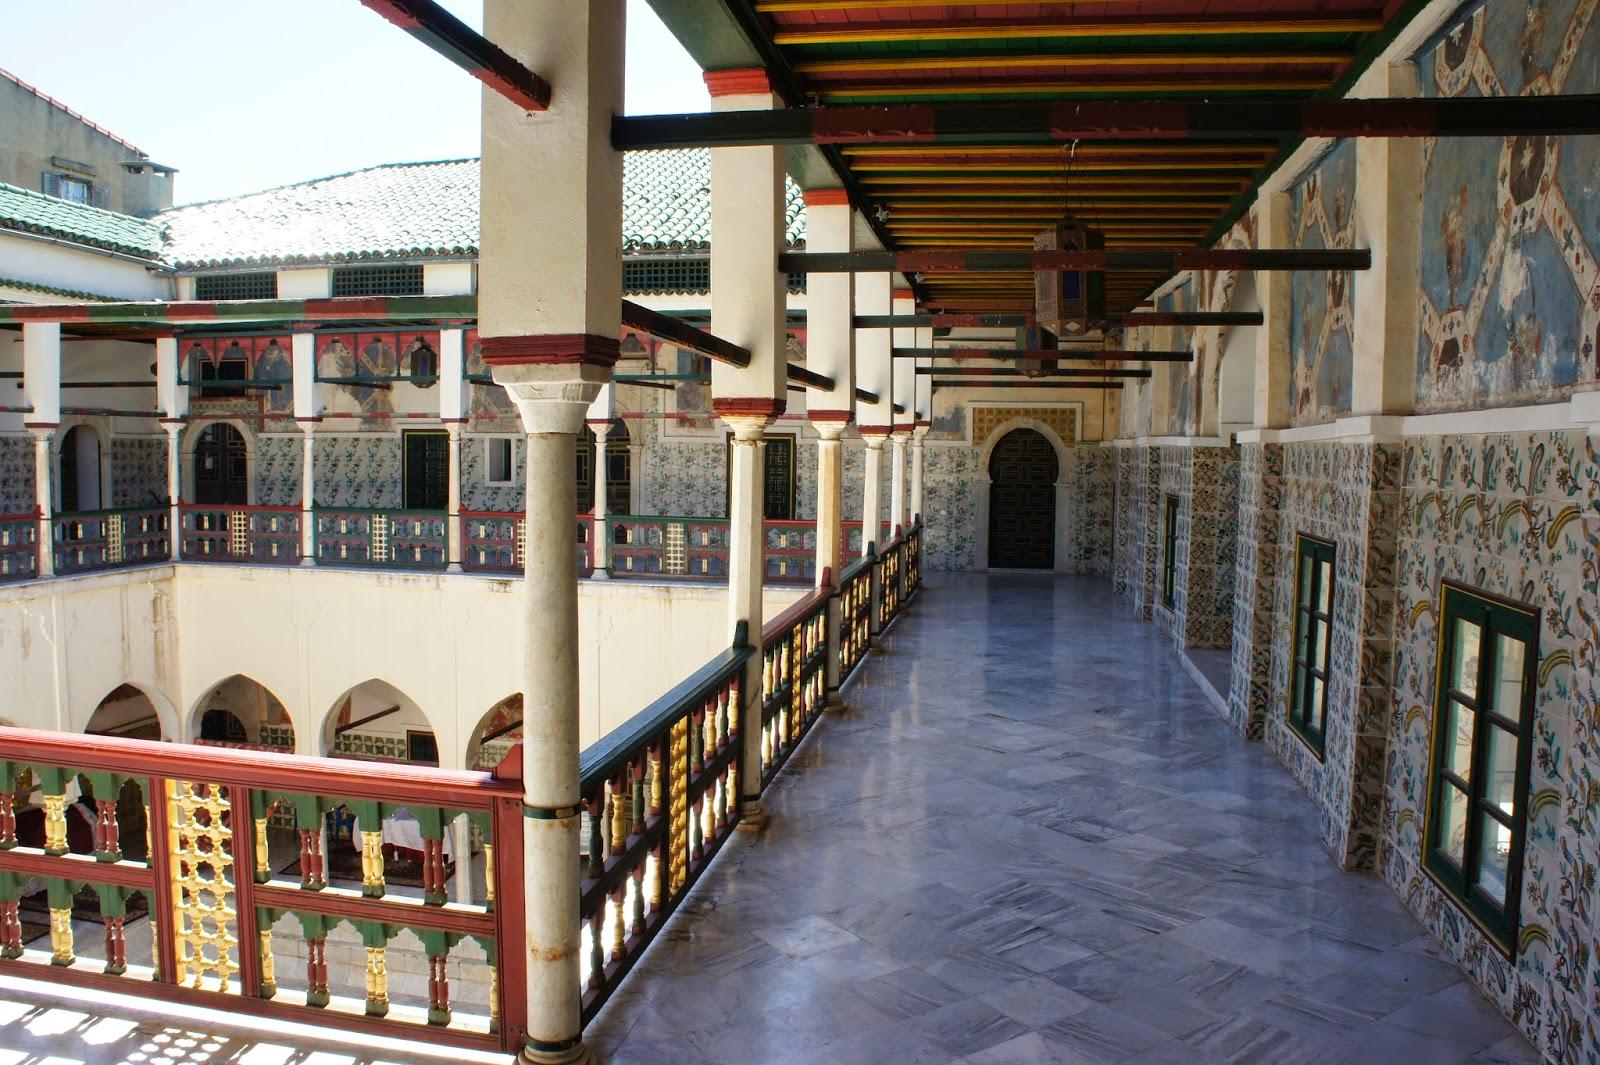 constantine-palais-ahmed-bey-interieur